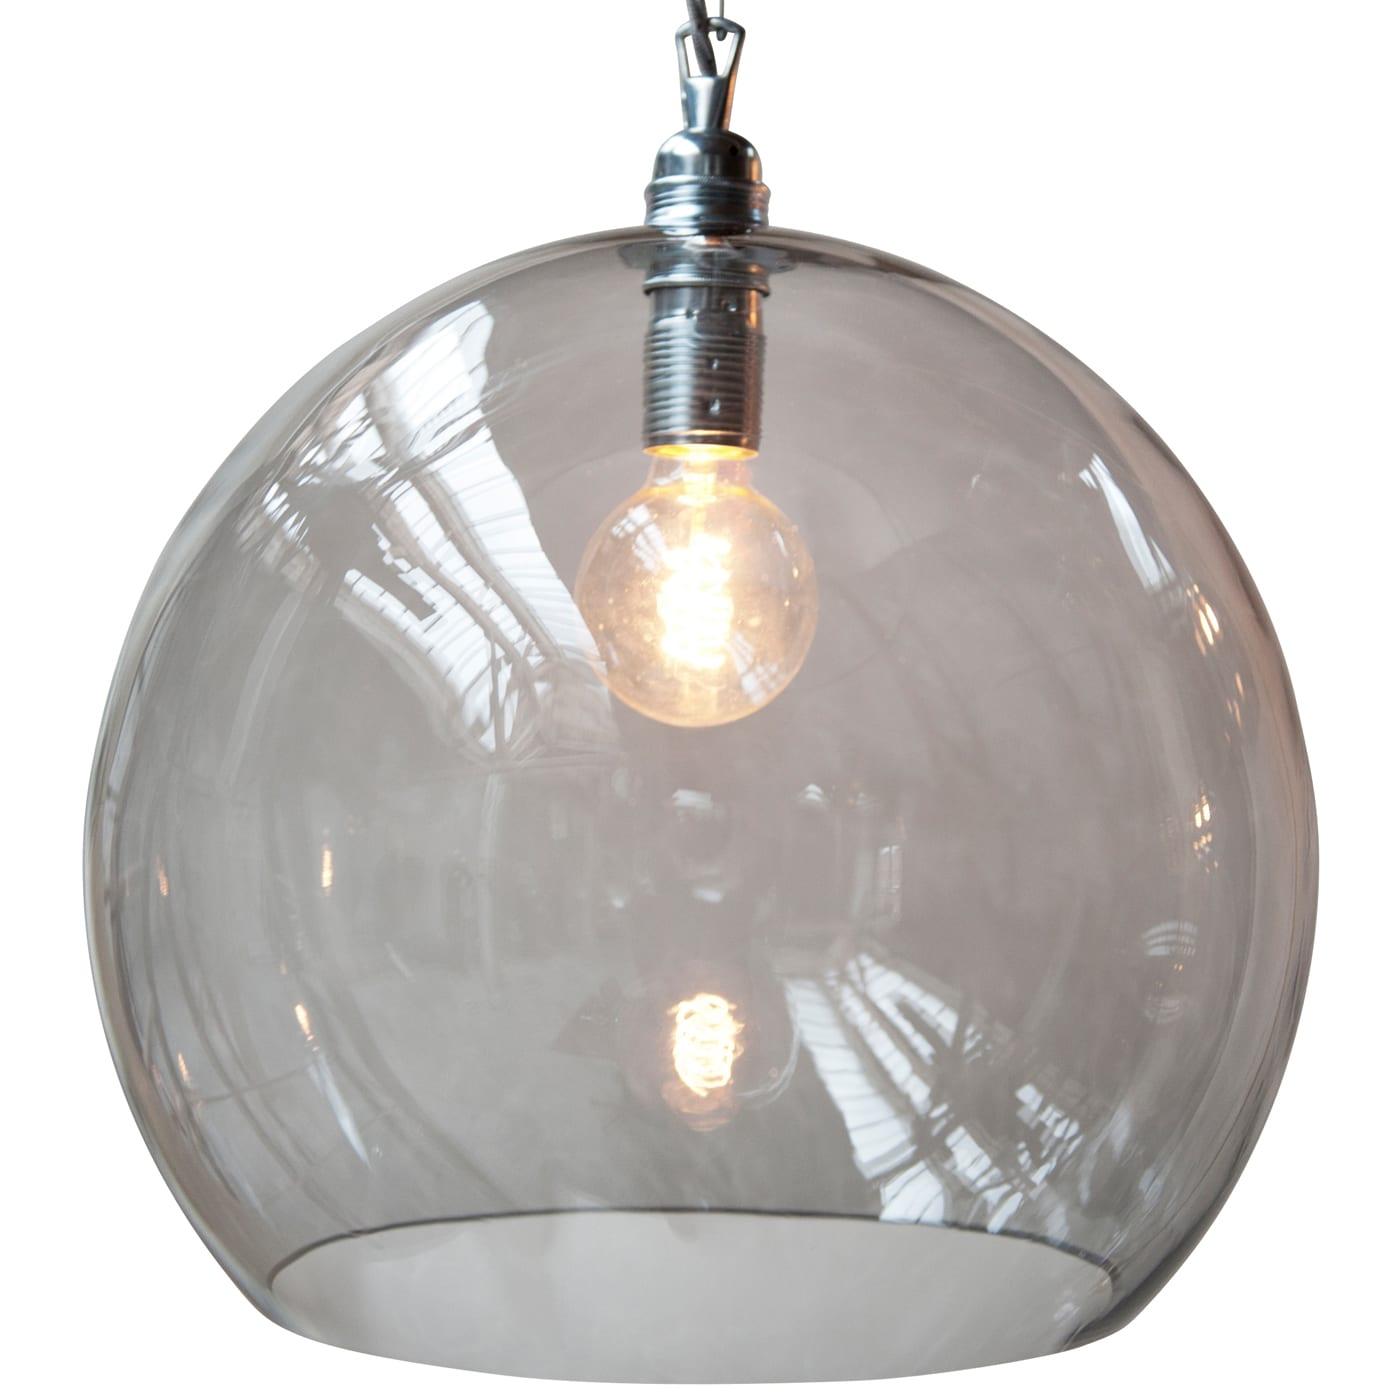 Rowan pendant lamp, smokey grey, 39cm